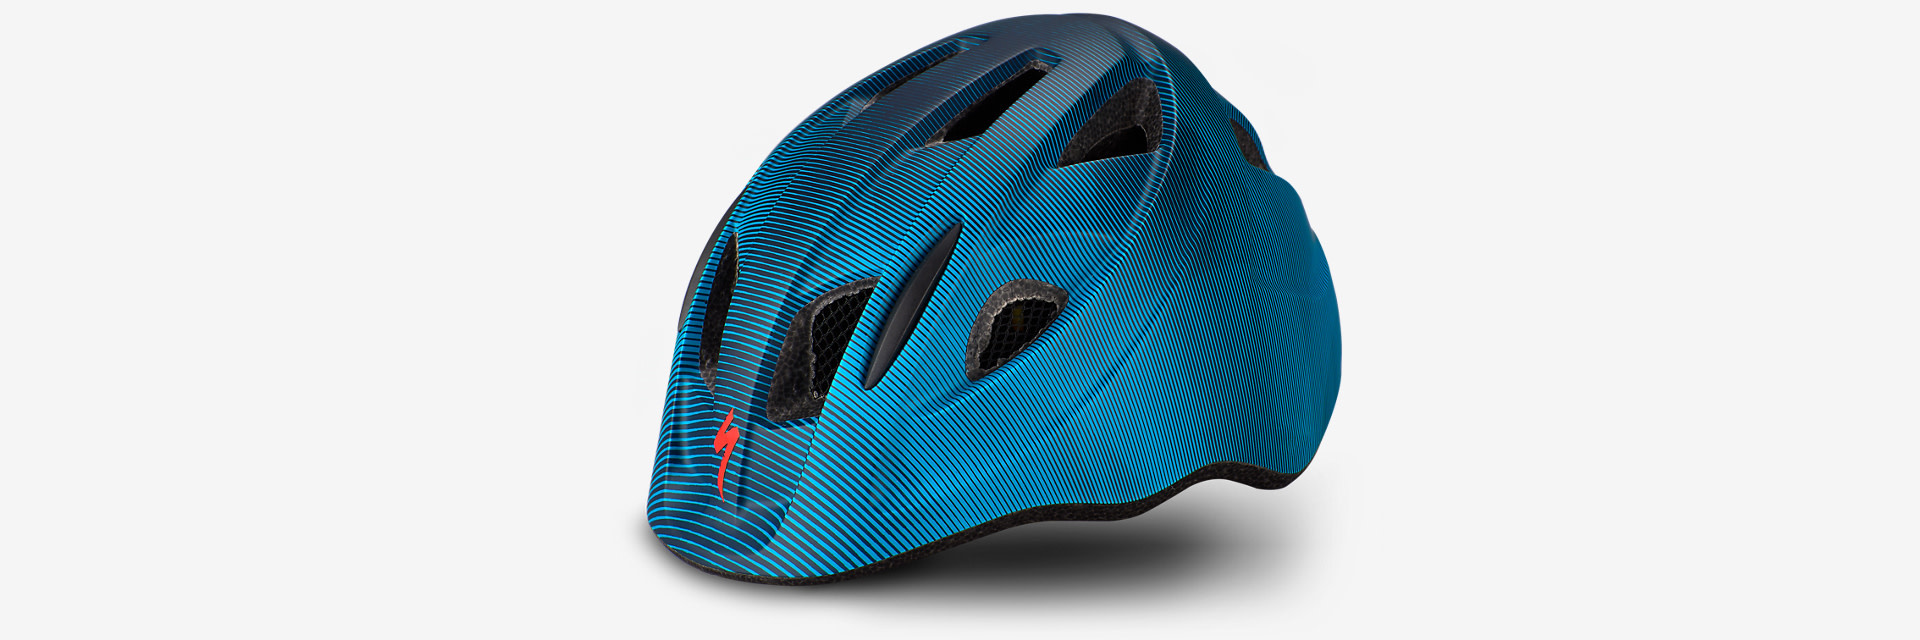 Specialized Helmet Mio Toddler SB Blue/Aqua Refraction